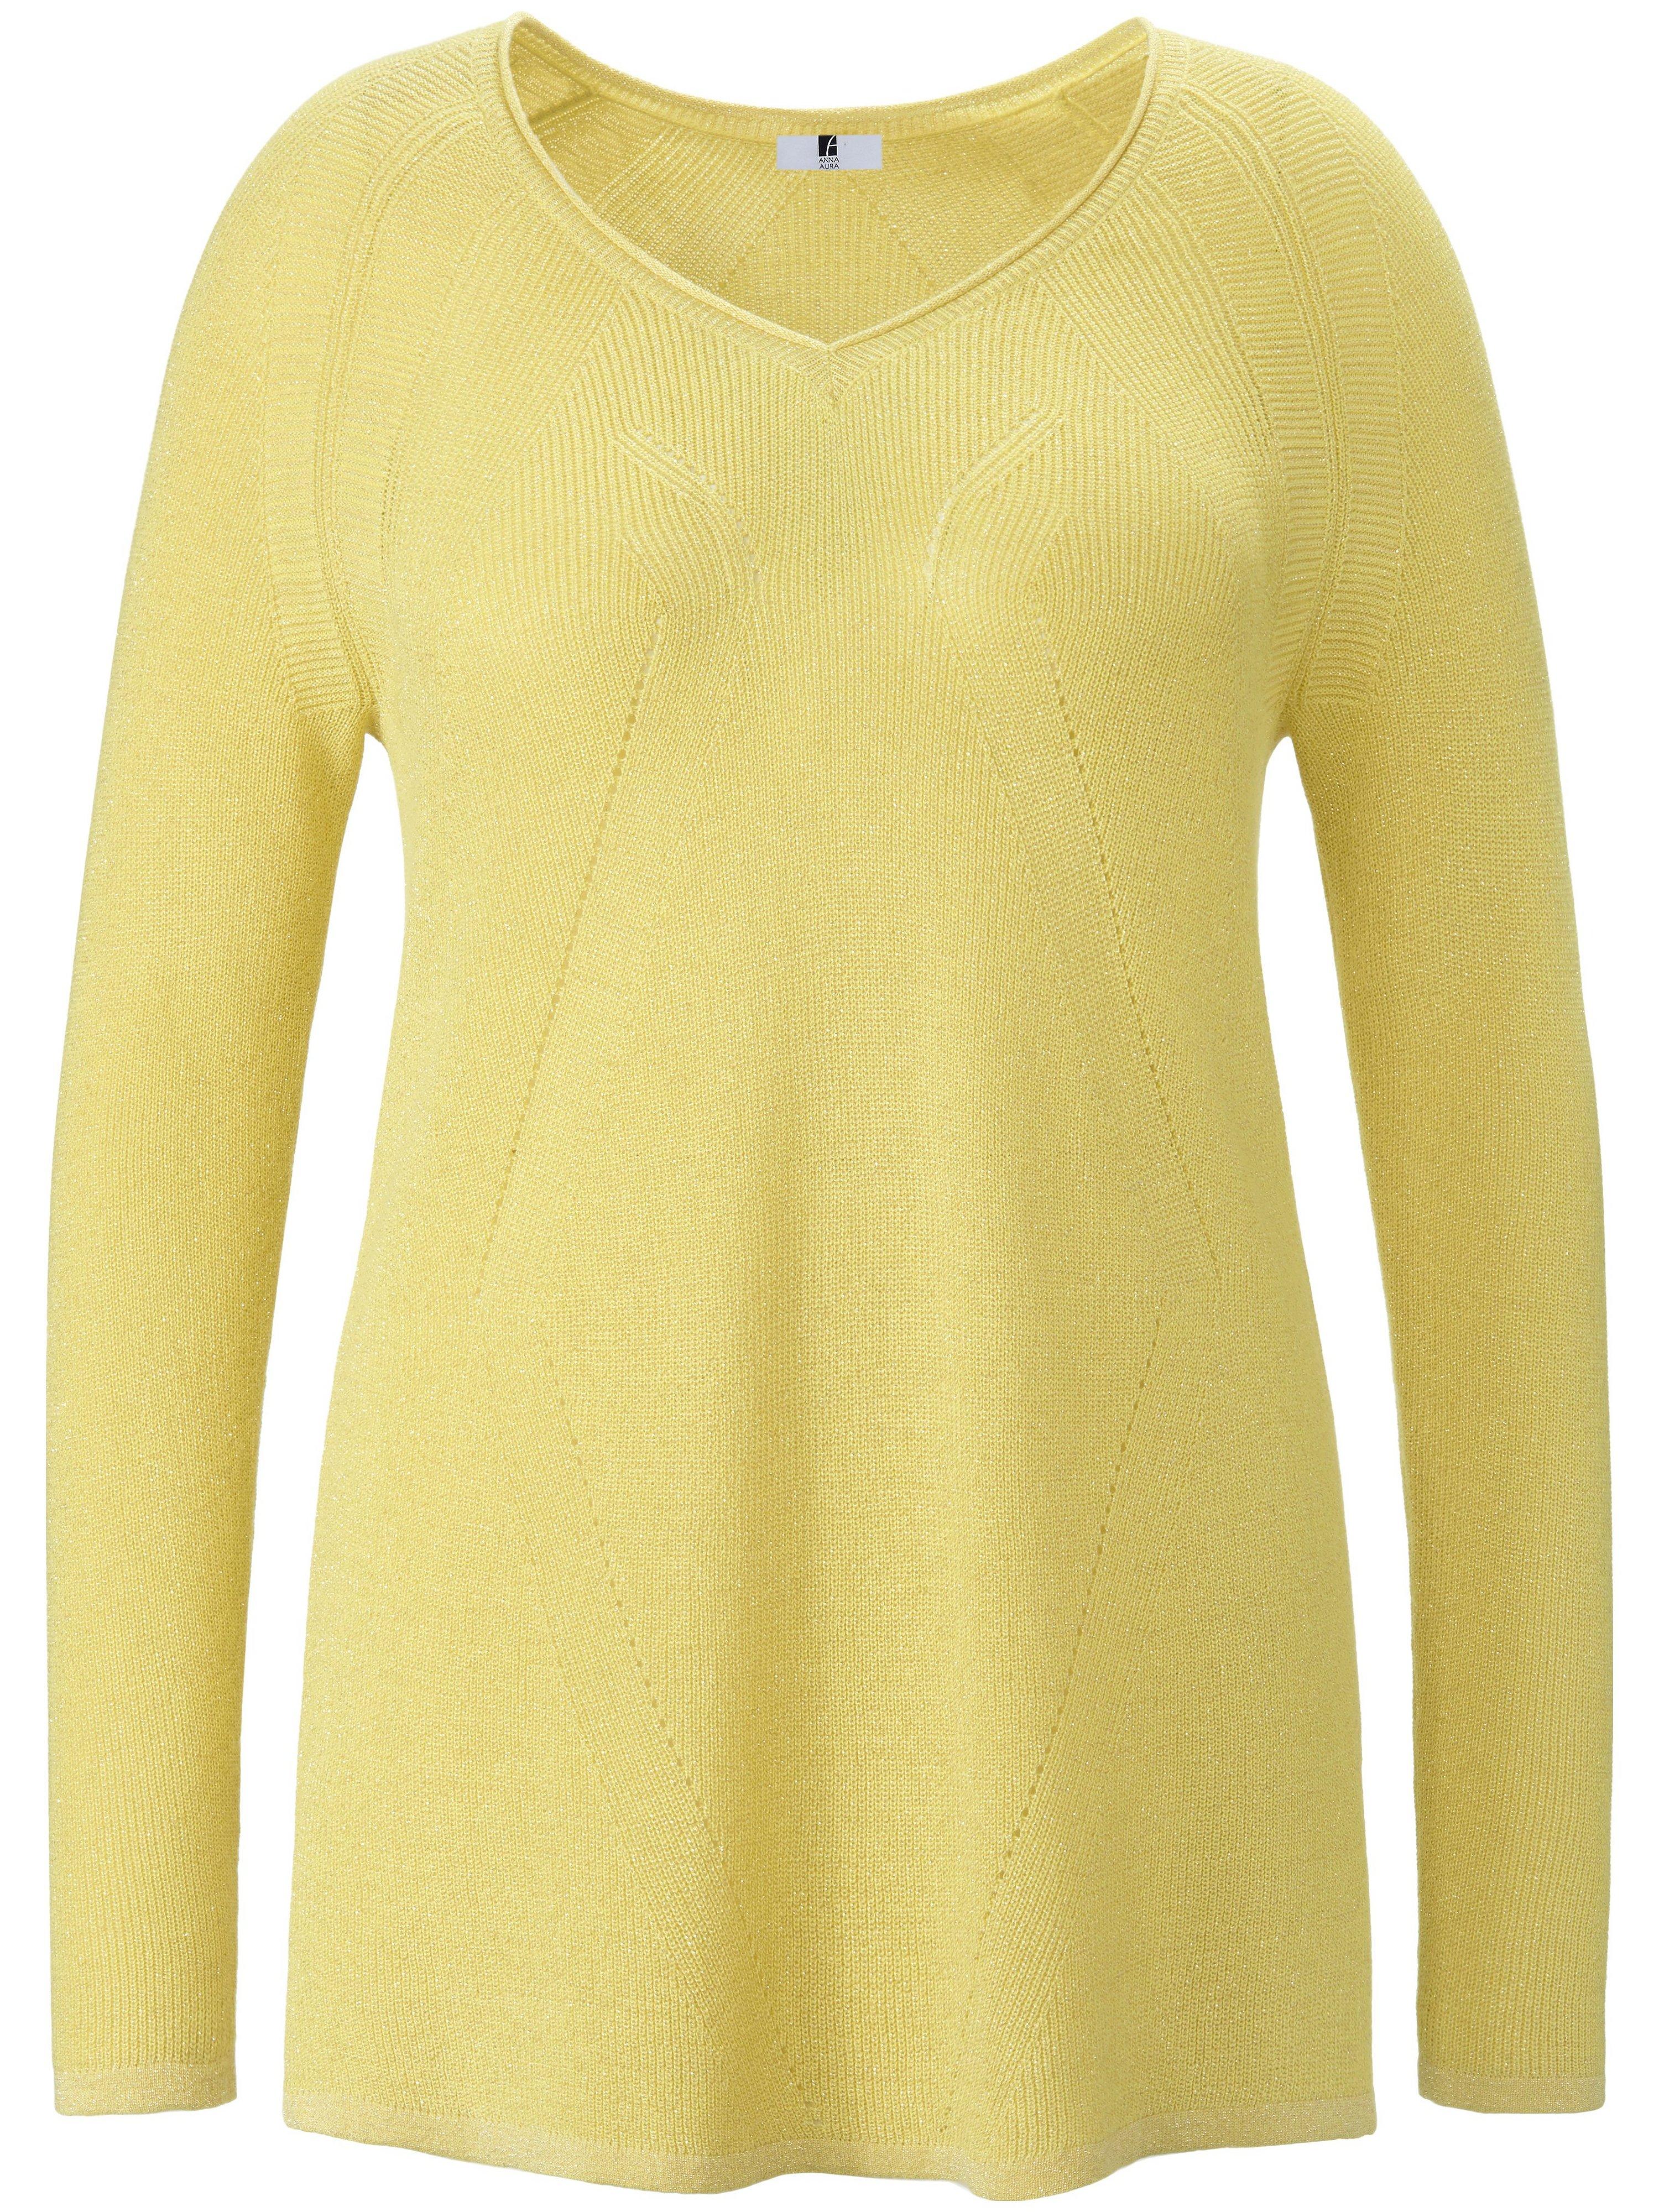 V-neck jumper long sleeves Anna Aura yellow